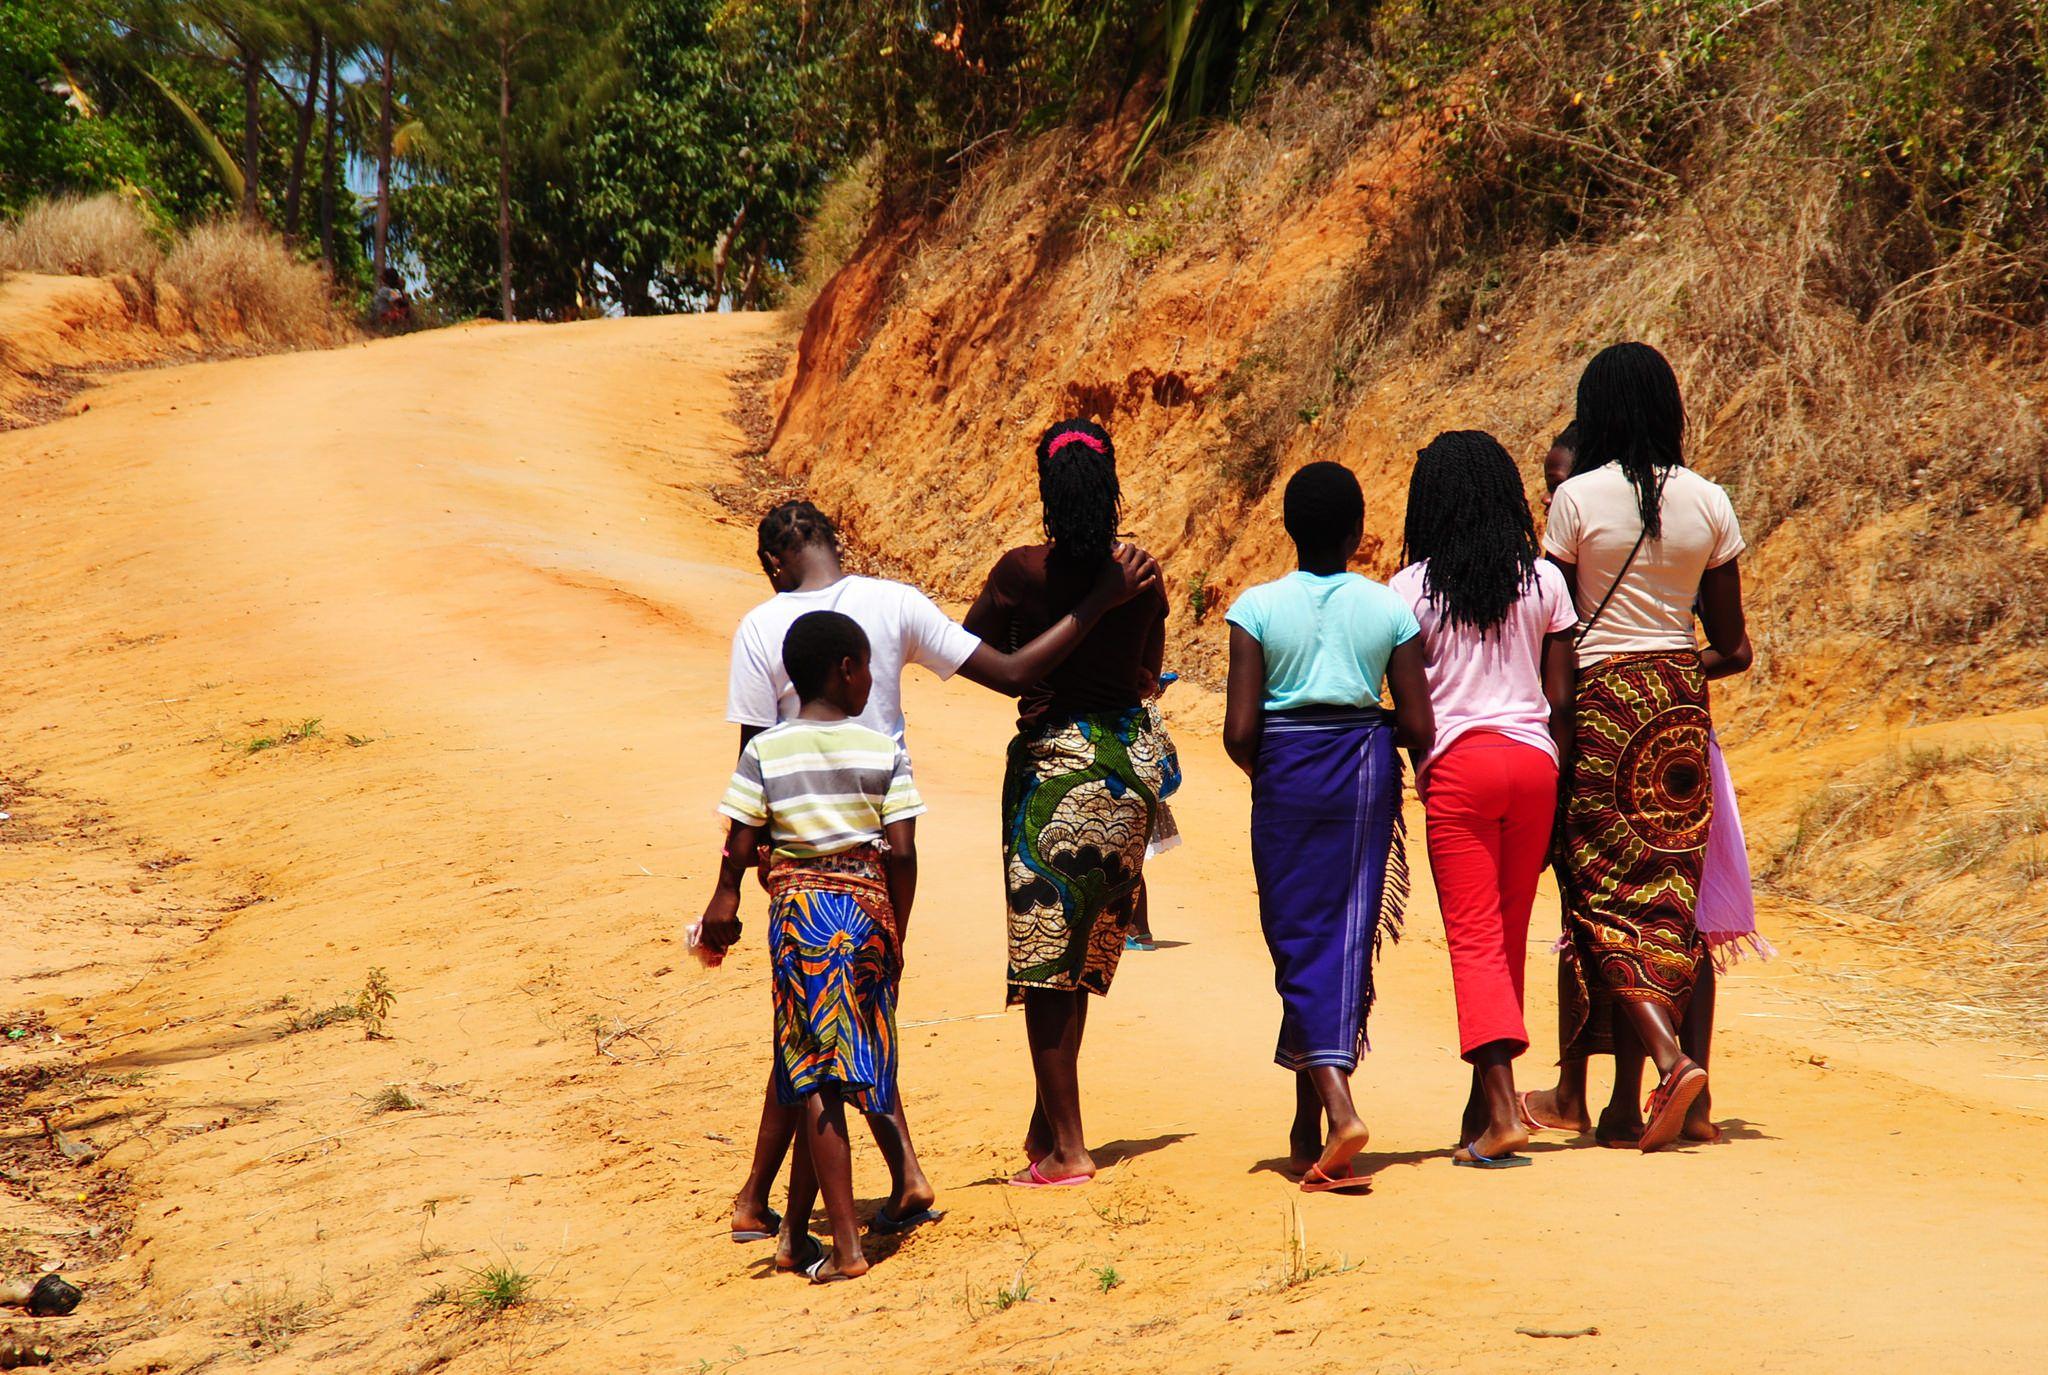 https://flic.kr/p/zM1SN8 | Meninas | Mongue | Moçambique